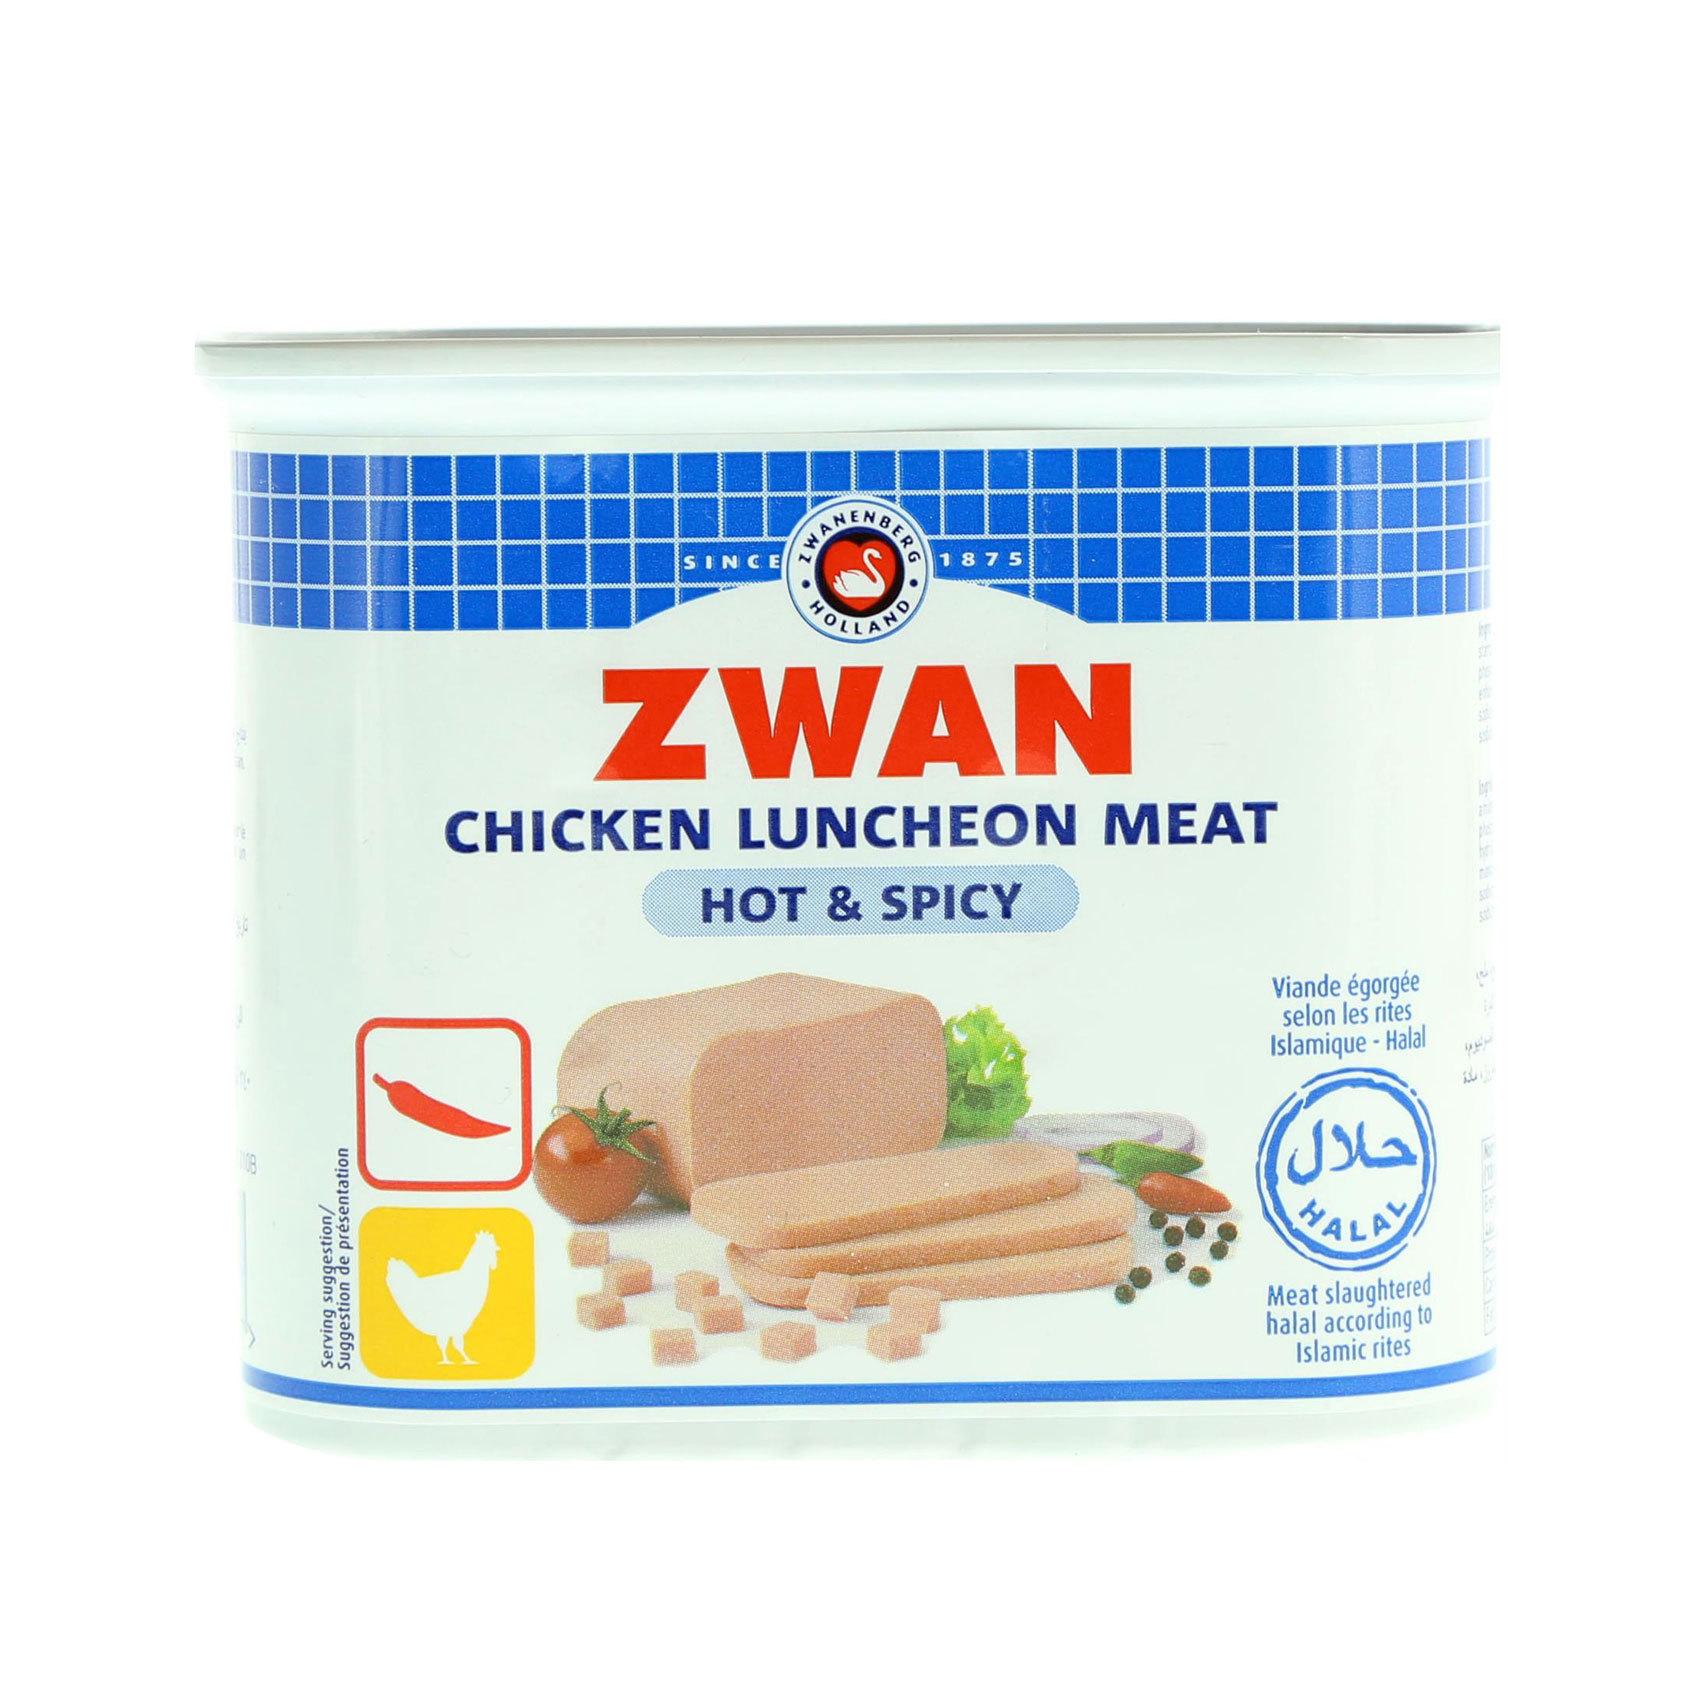 ZWAN LUNCHEON MEAT CHKN H/S 340G